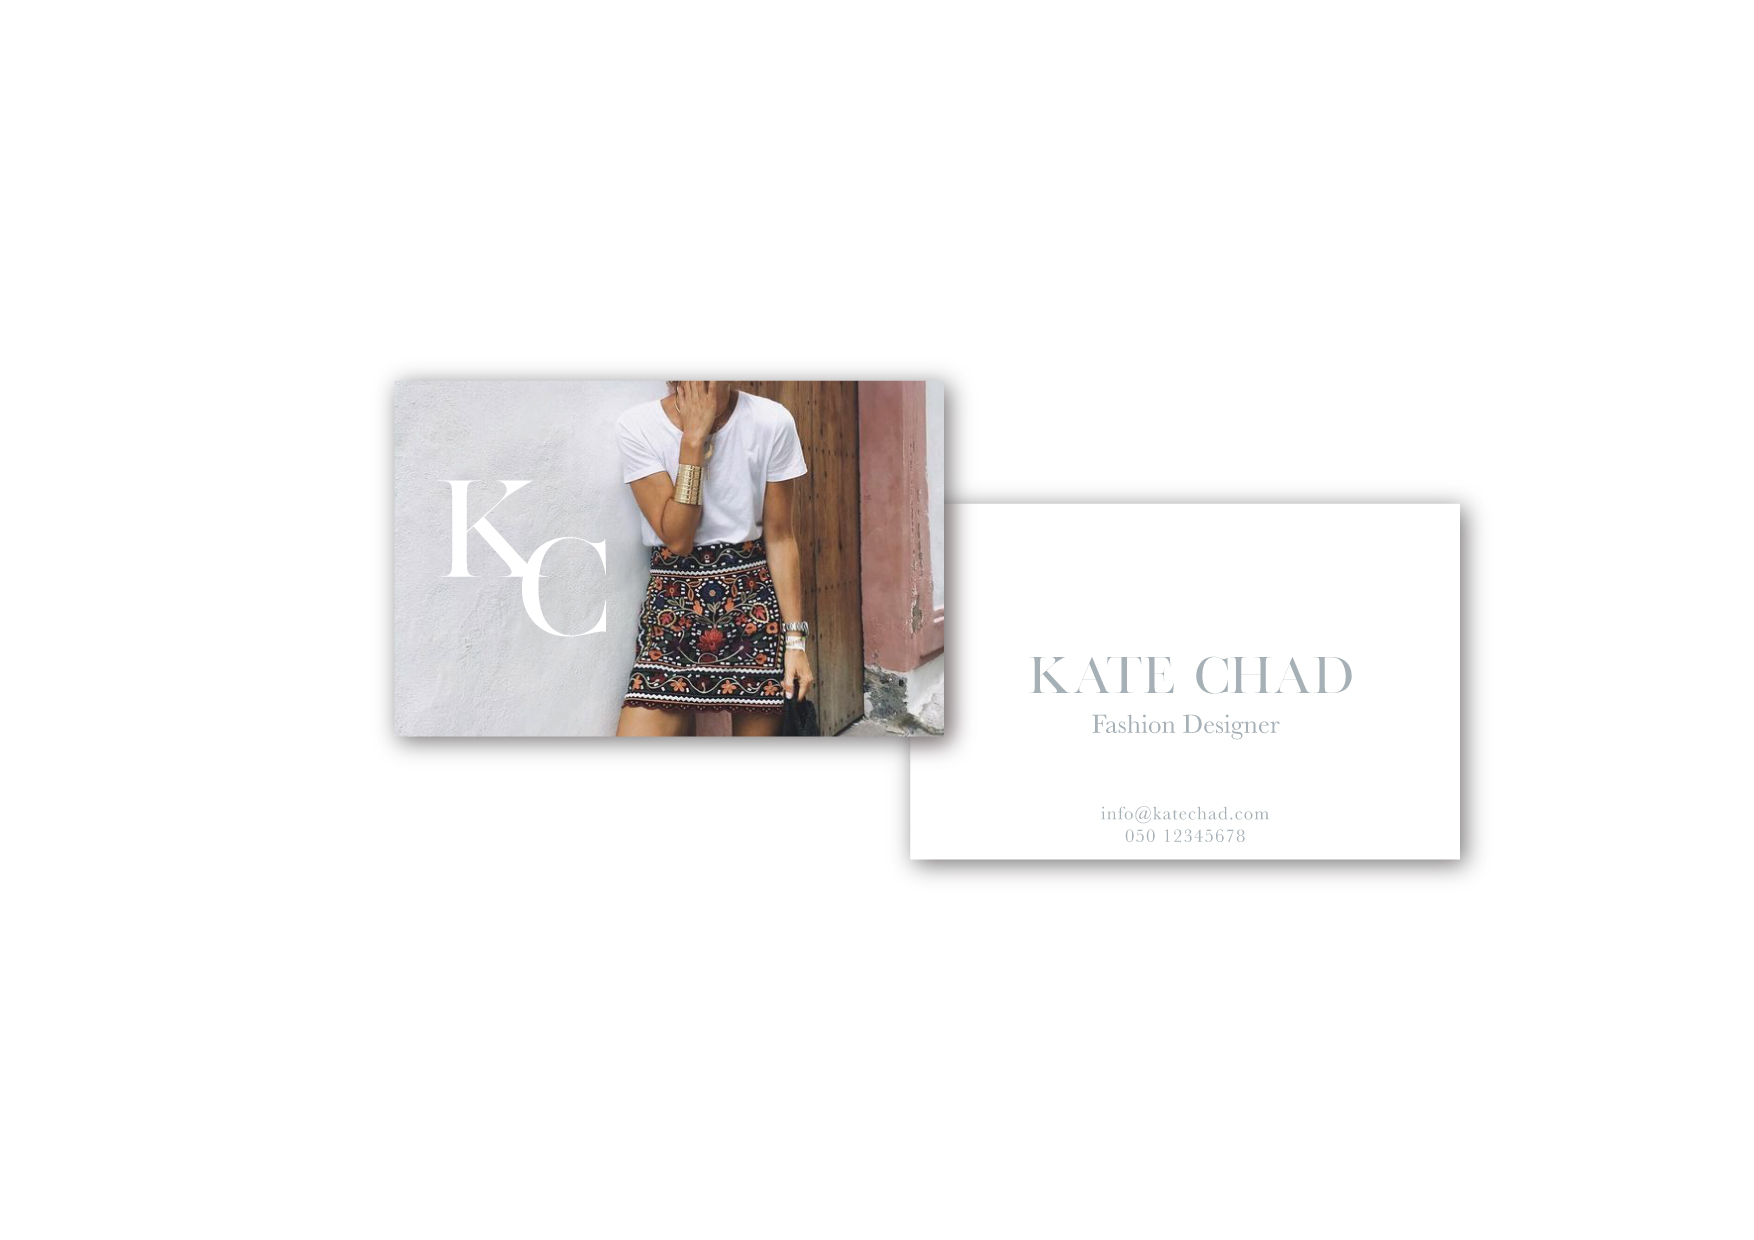 Kate Chad Logo Concept 2_9.jpg